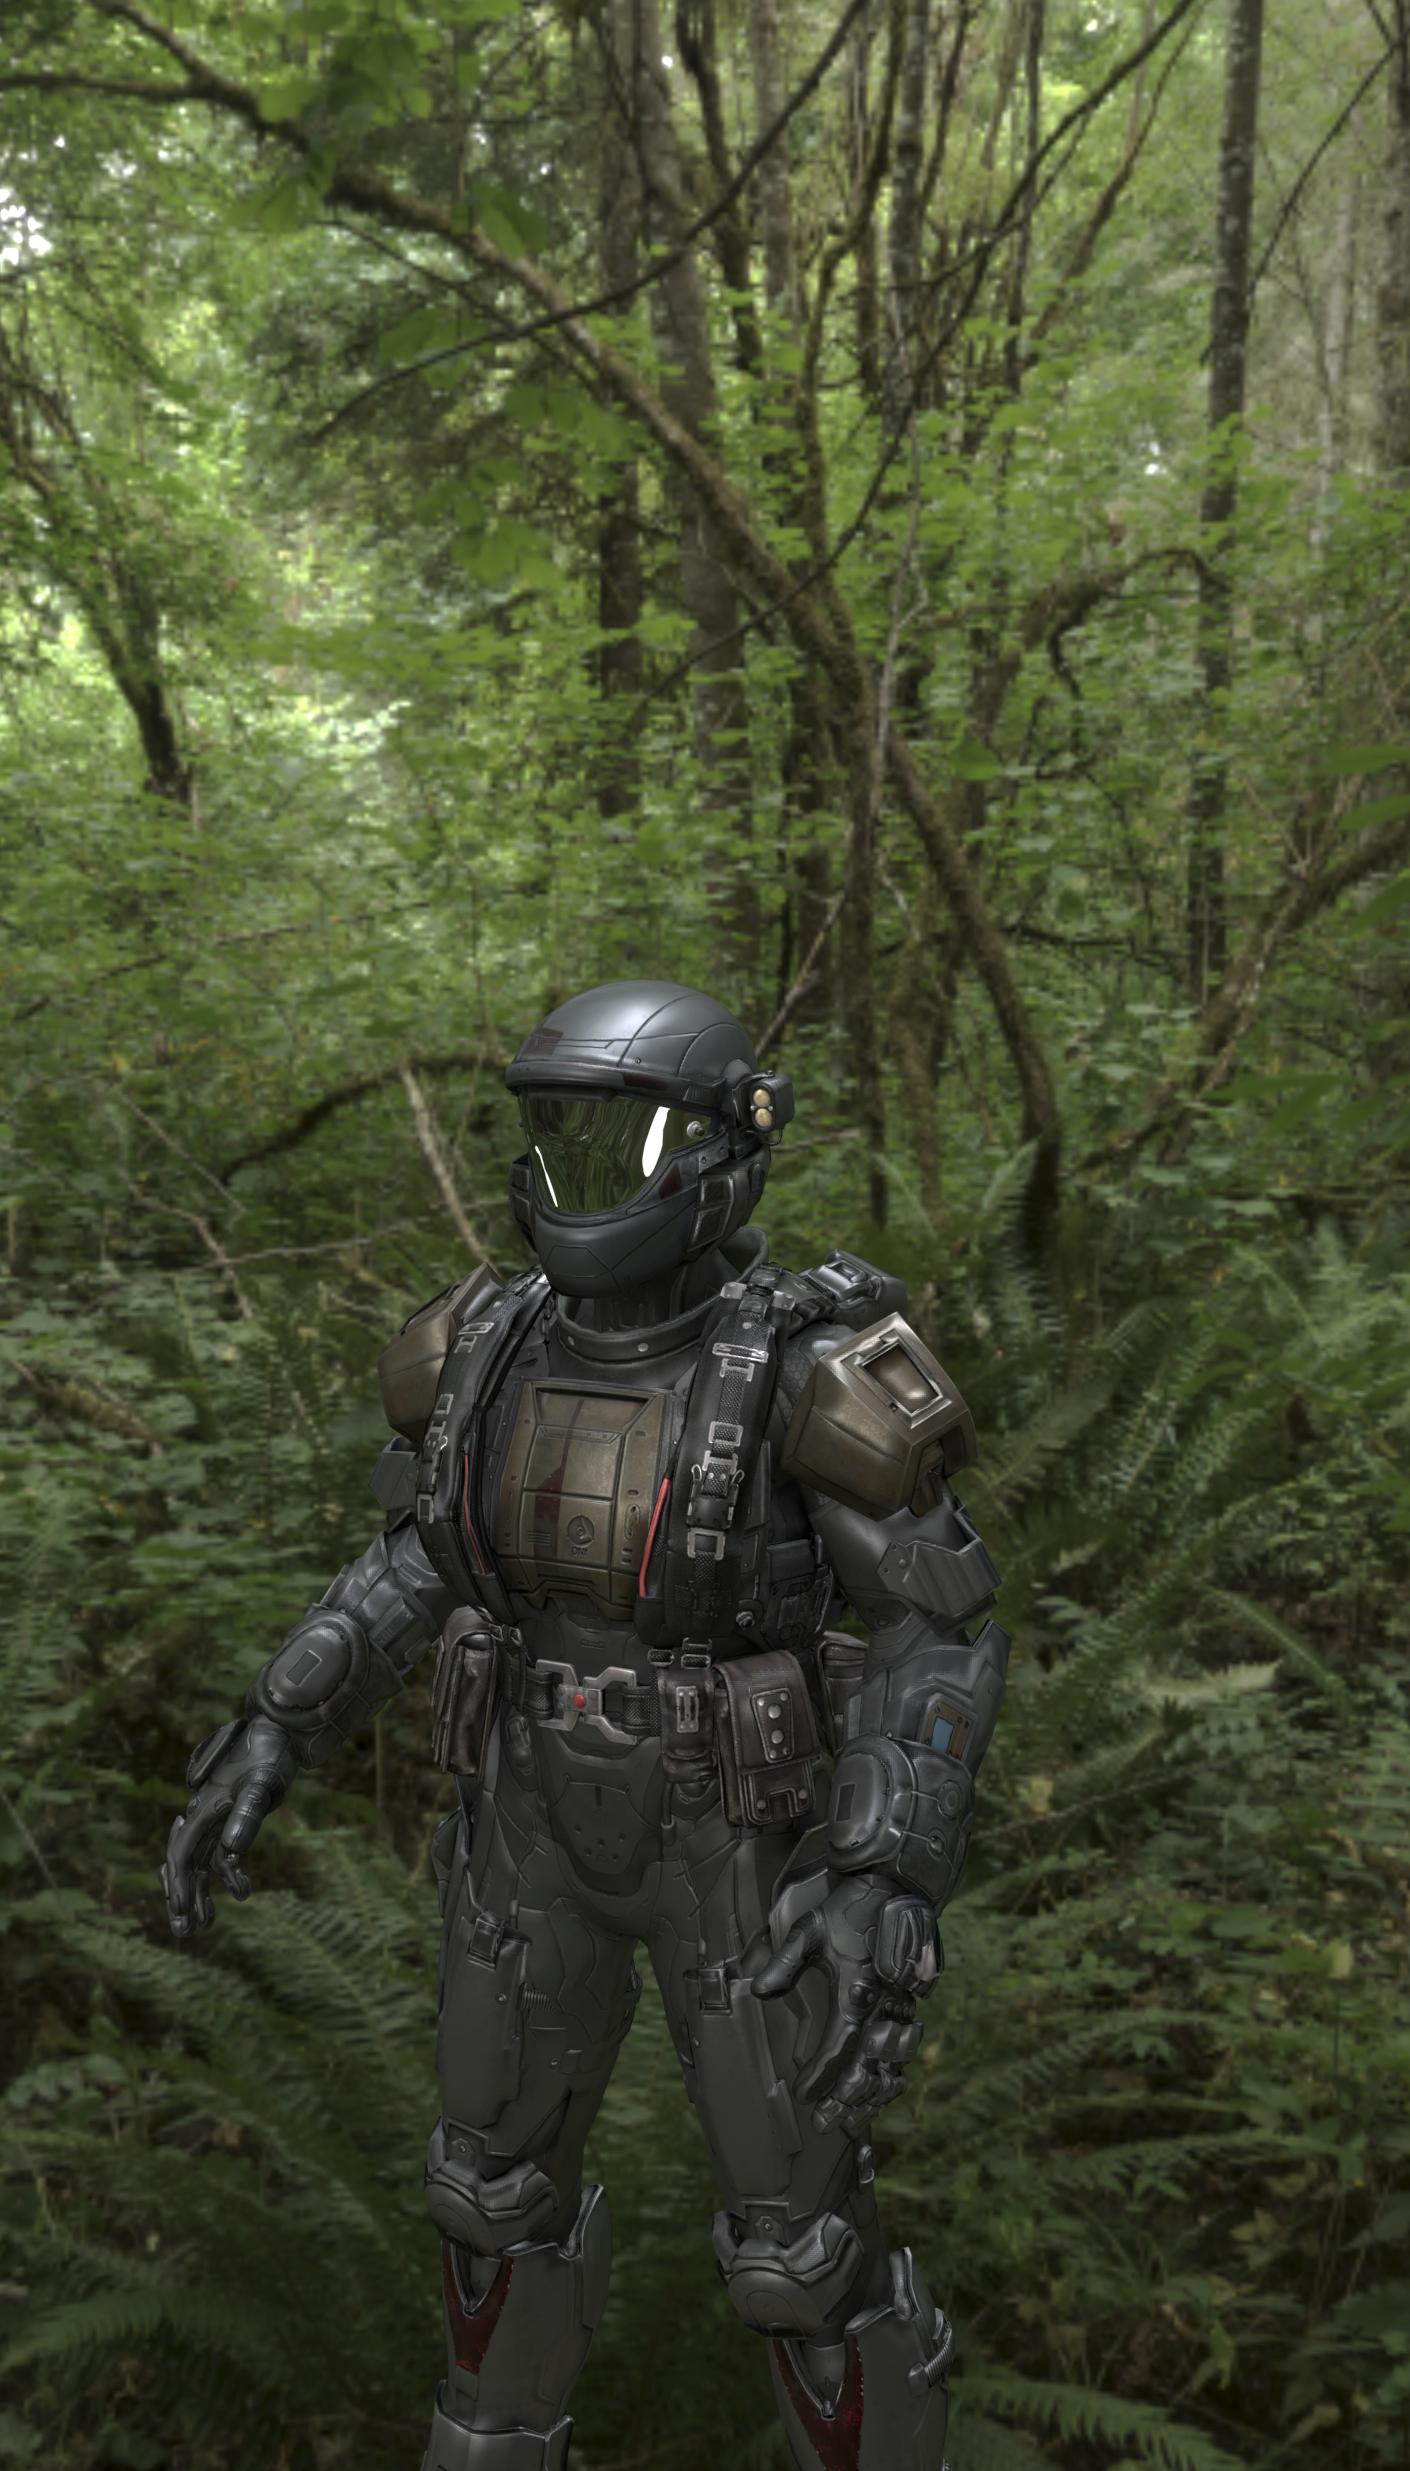 Halo Nightfall Armor By Wolffire1010 On Deviantart